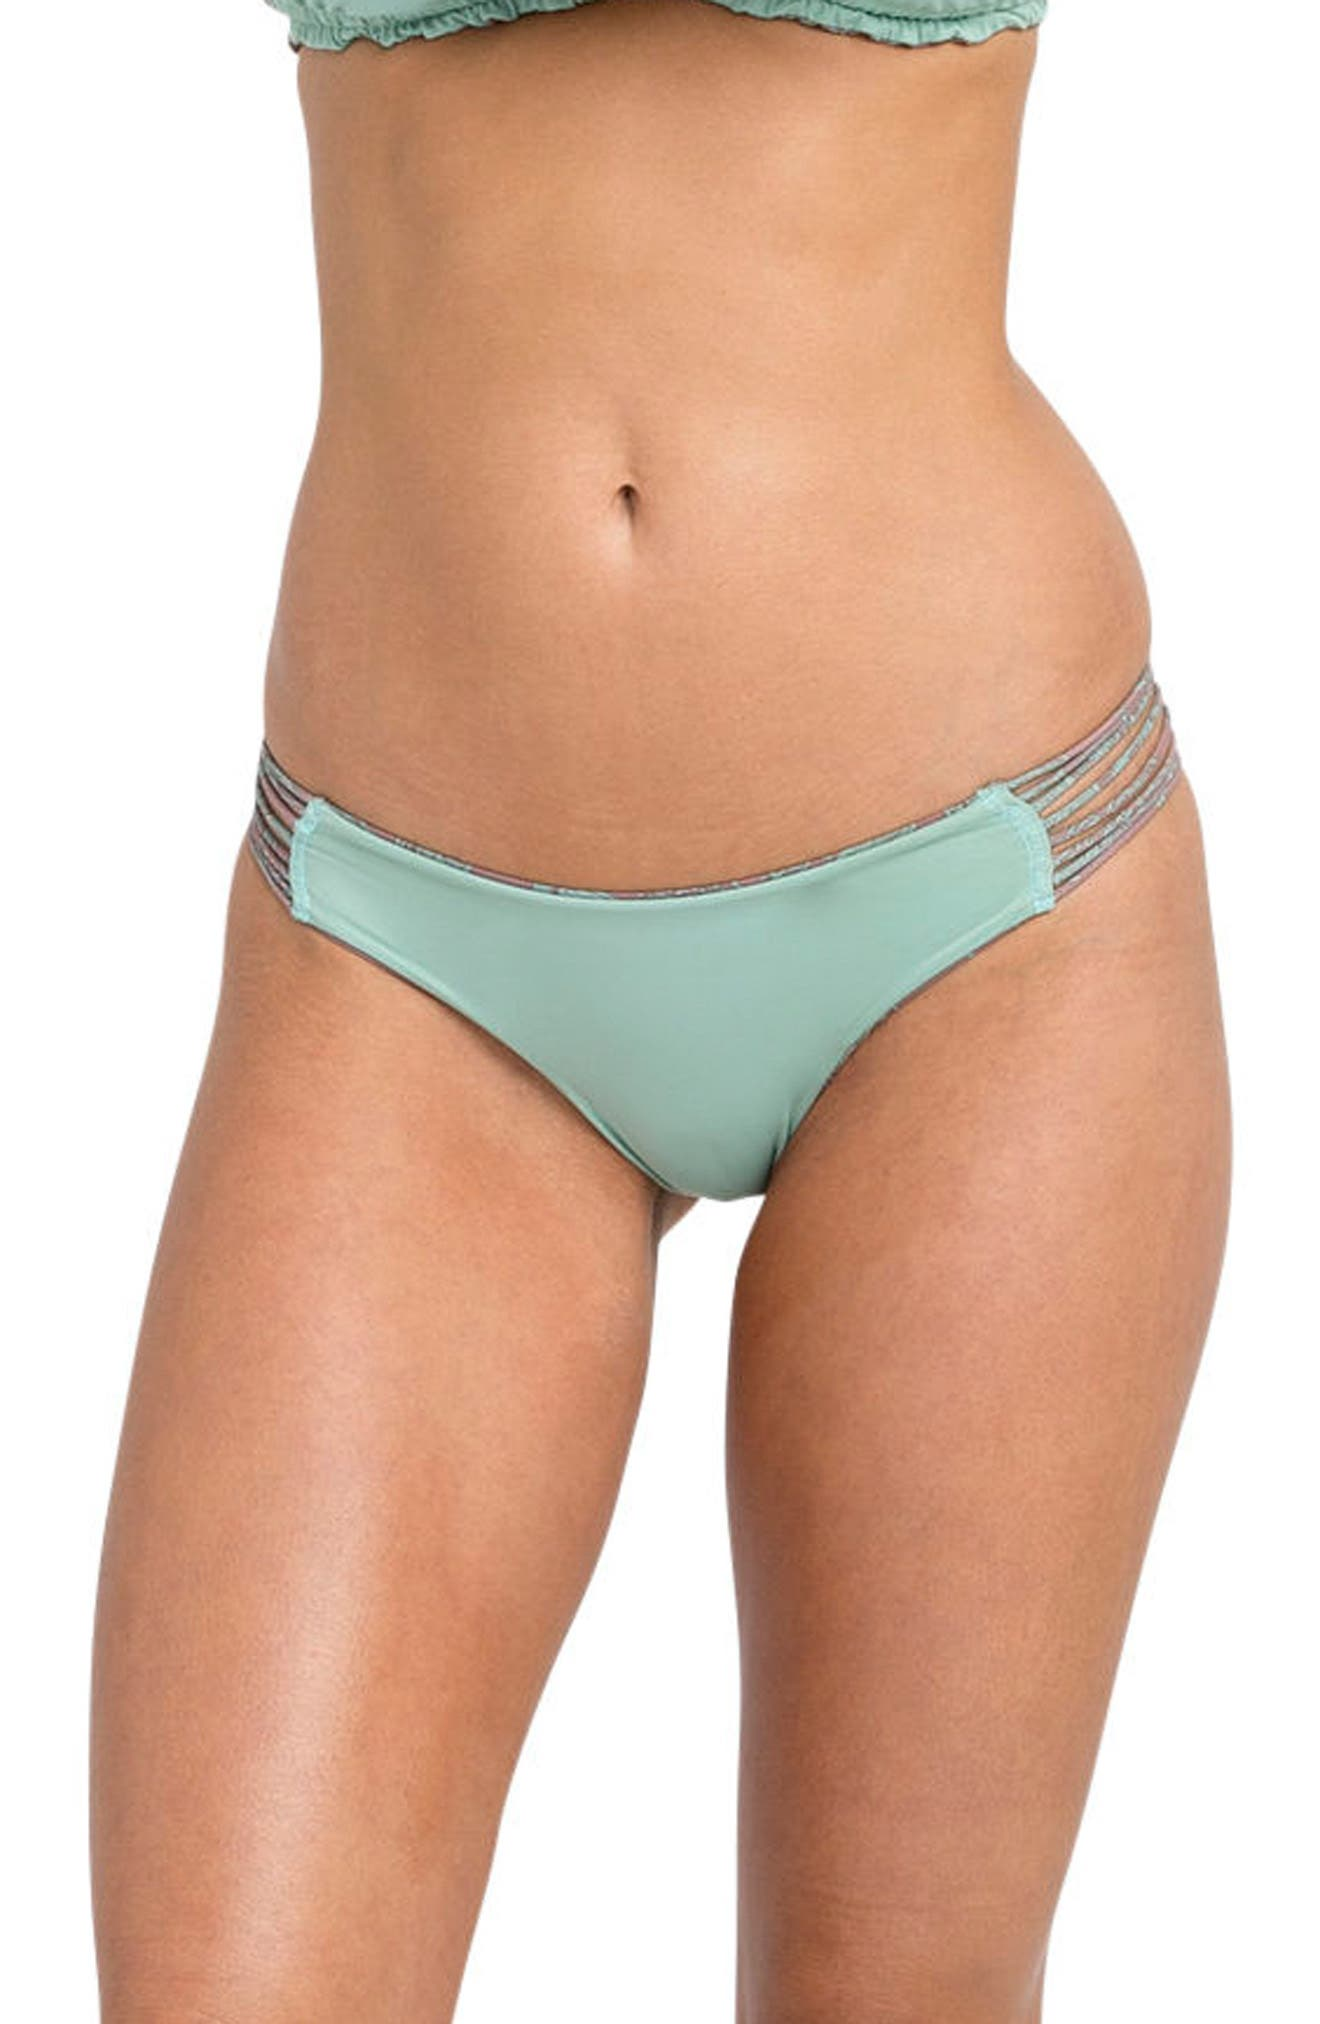 Palmer Reversible Cheeky Bikini Bottoms,                             Alternate thumbnail 2, color,                             500